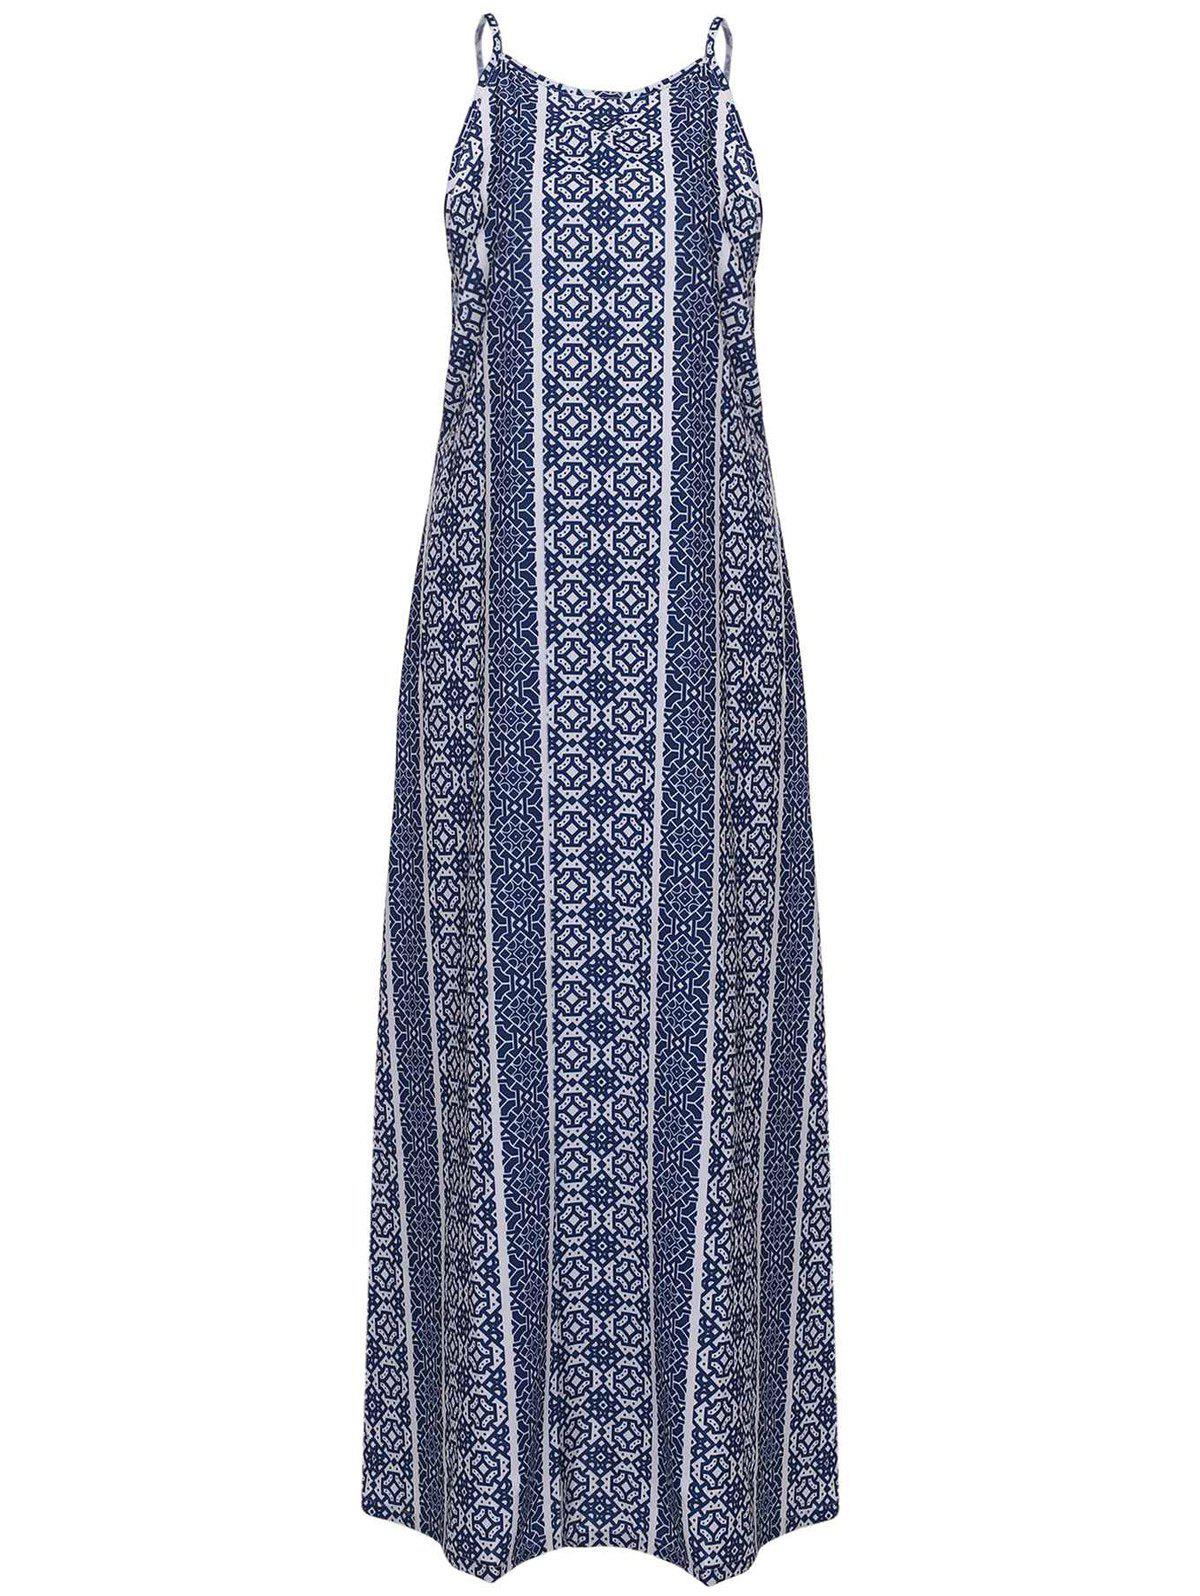 Spaghetti Strap Sleeveless Print Maxi Dress 135855702